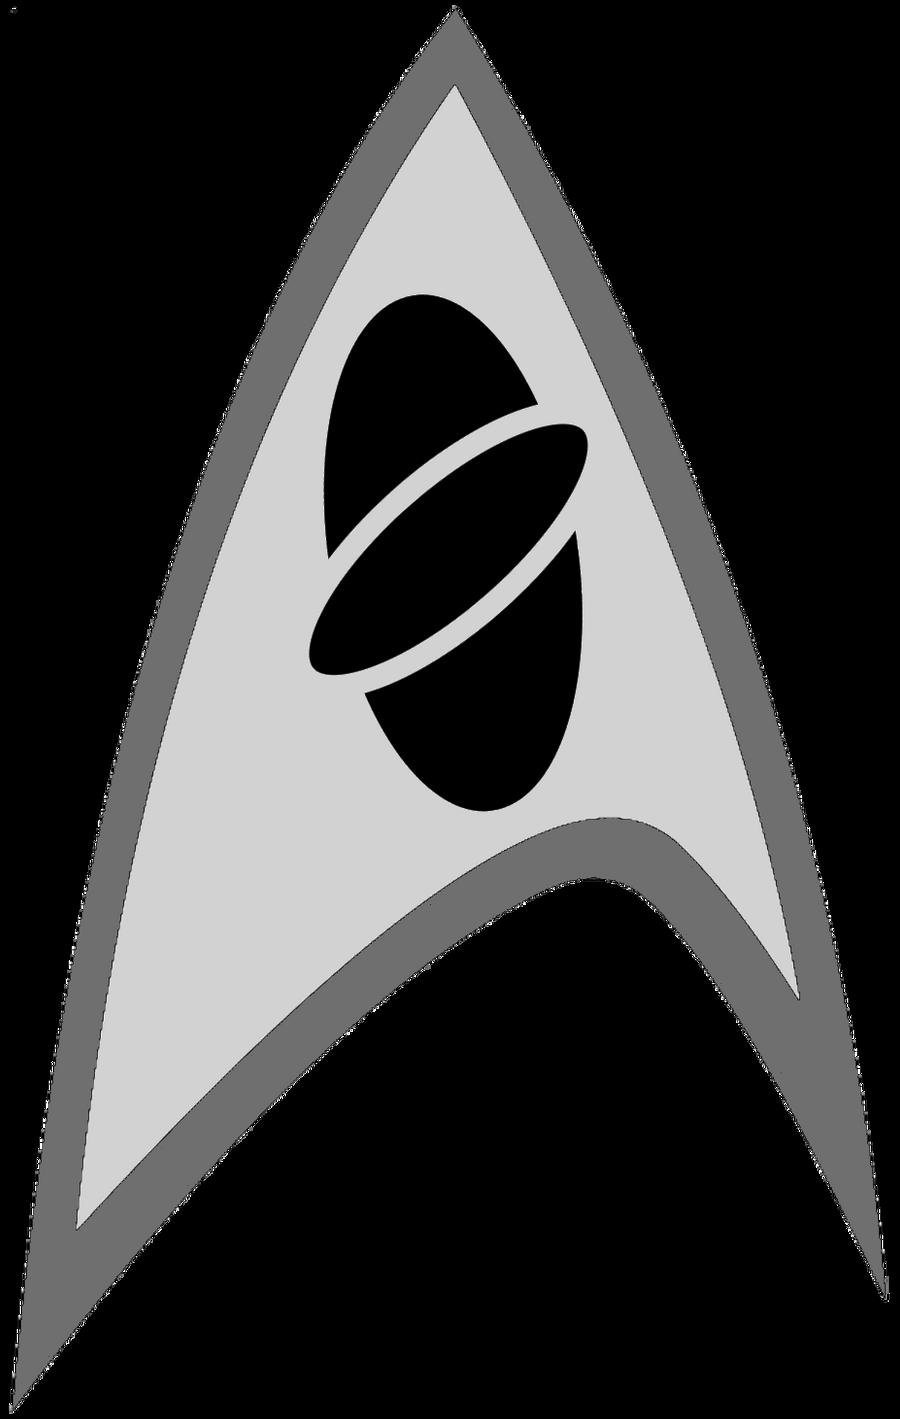 New Star Trek Science Logo